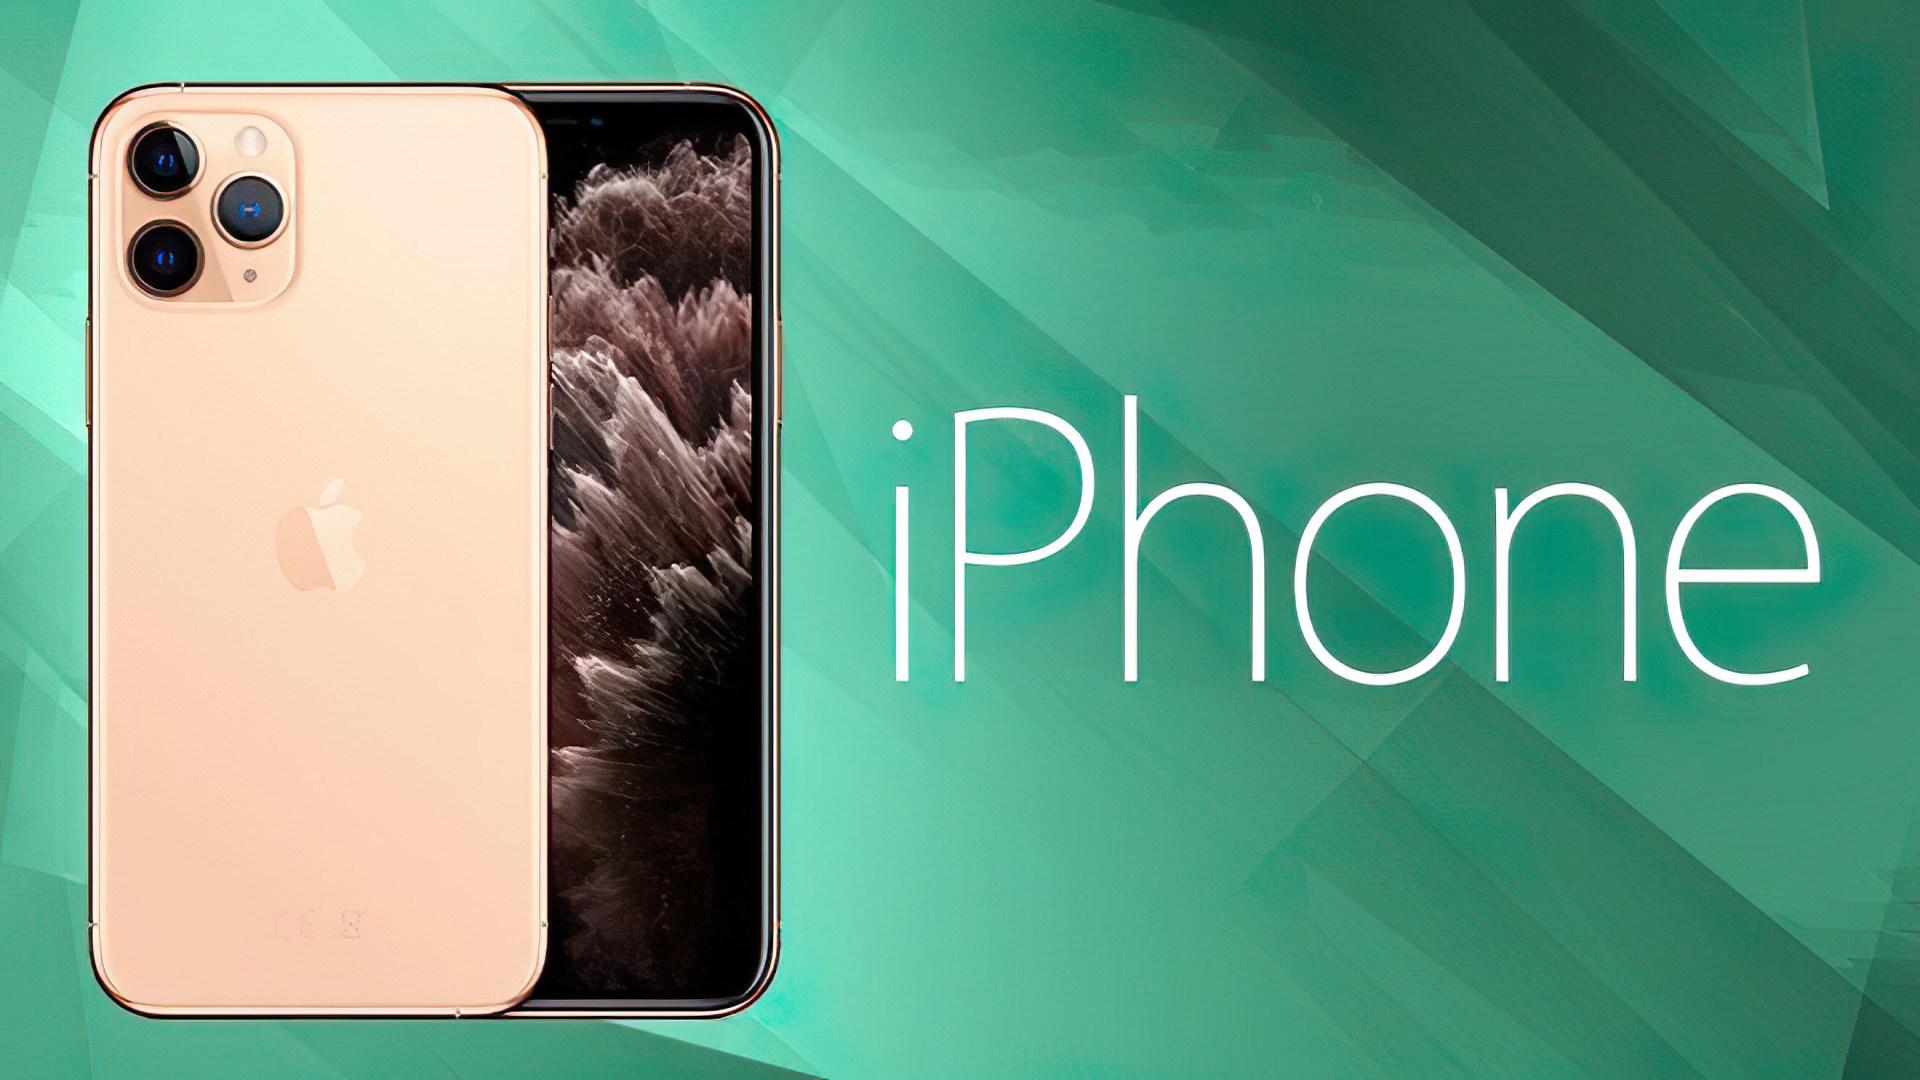 Smartphone, Apple, Iphone, Logo, Apple iPhone, iPhone X, Apple iPhone X, iPhone Gold